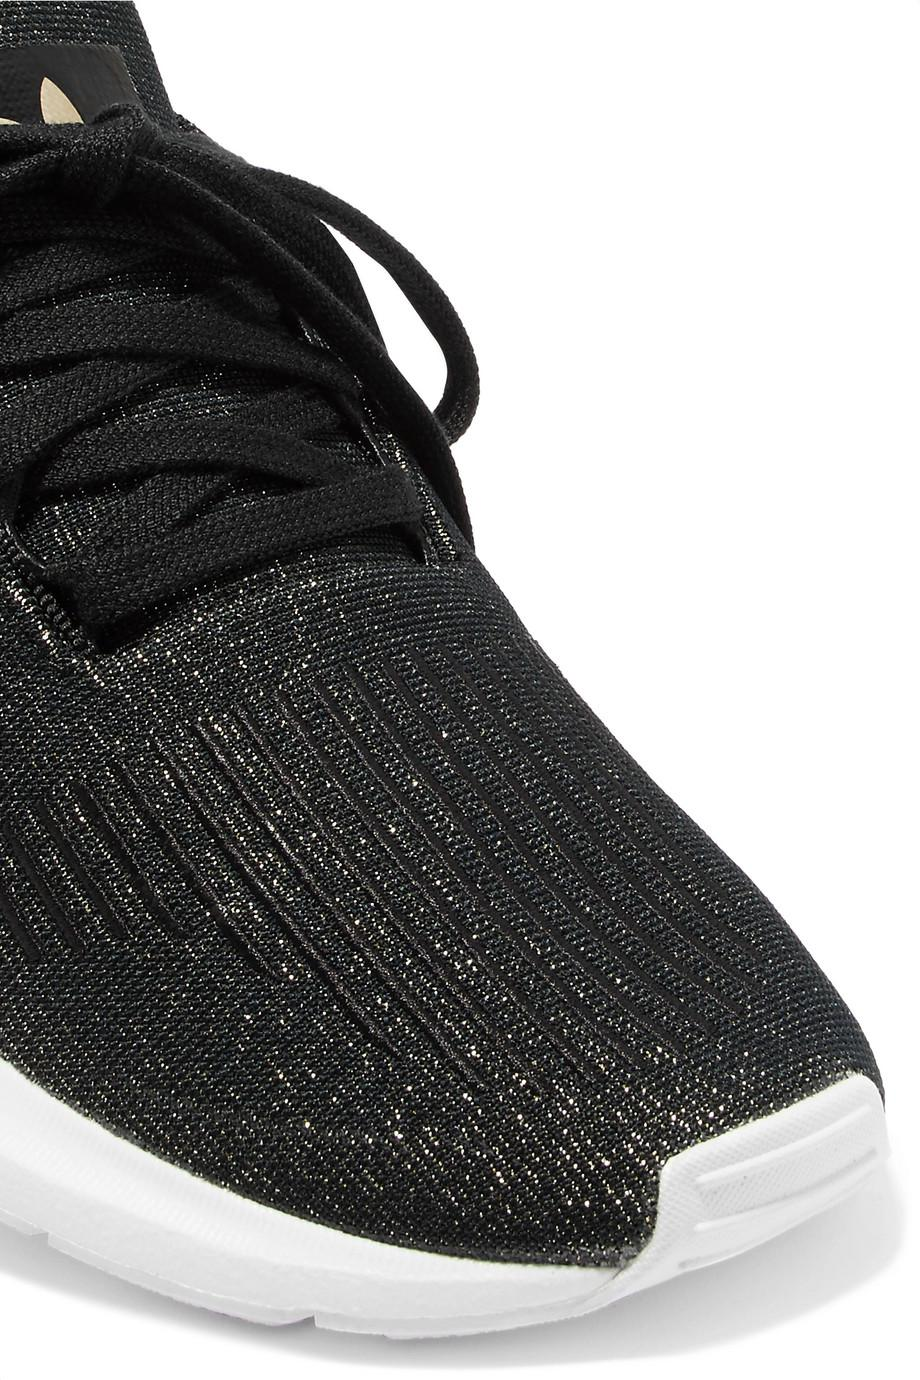 Swift Run Glittered Primeknit Sneakers - Black adidas Originals 12RNLkhaBJ